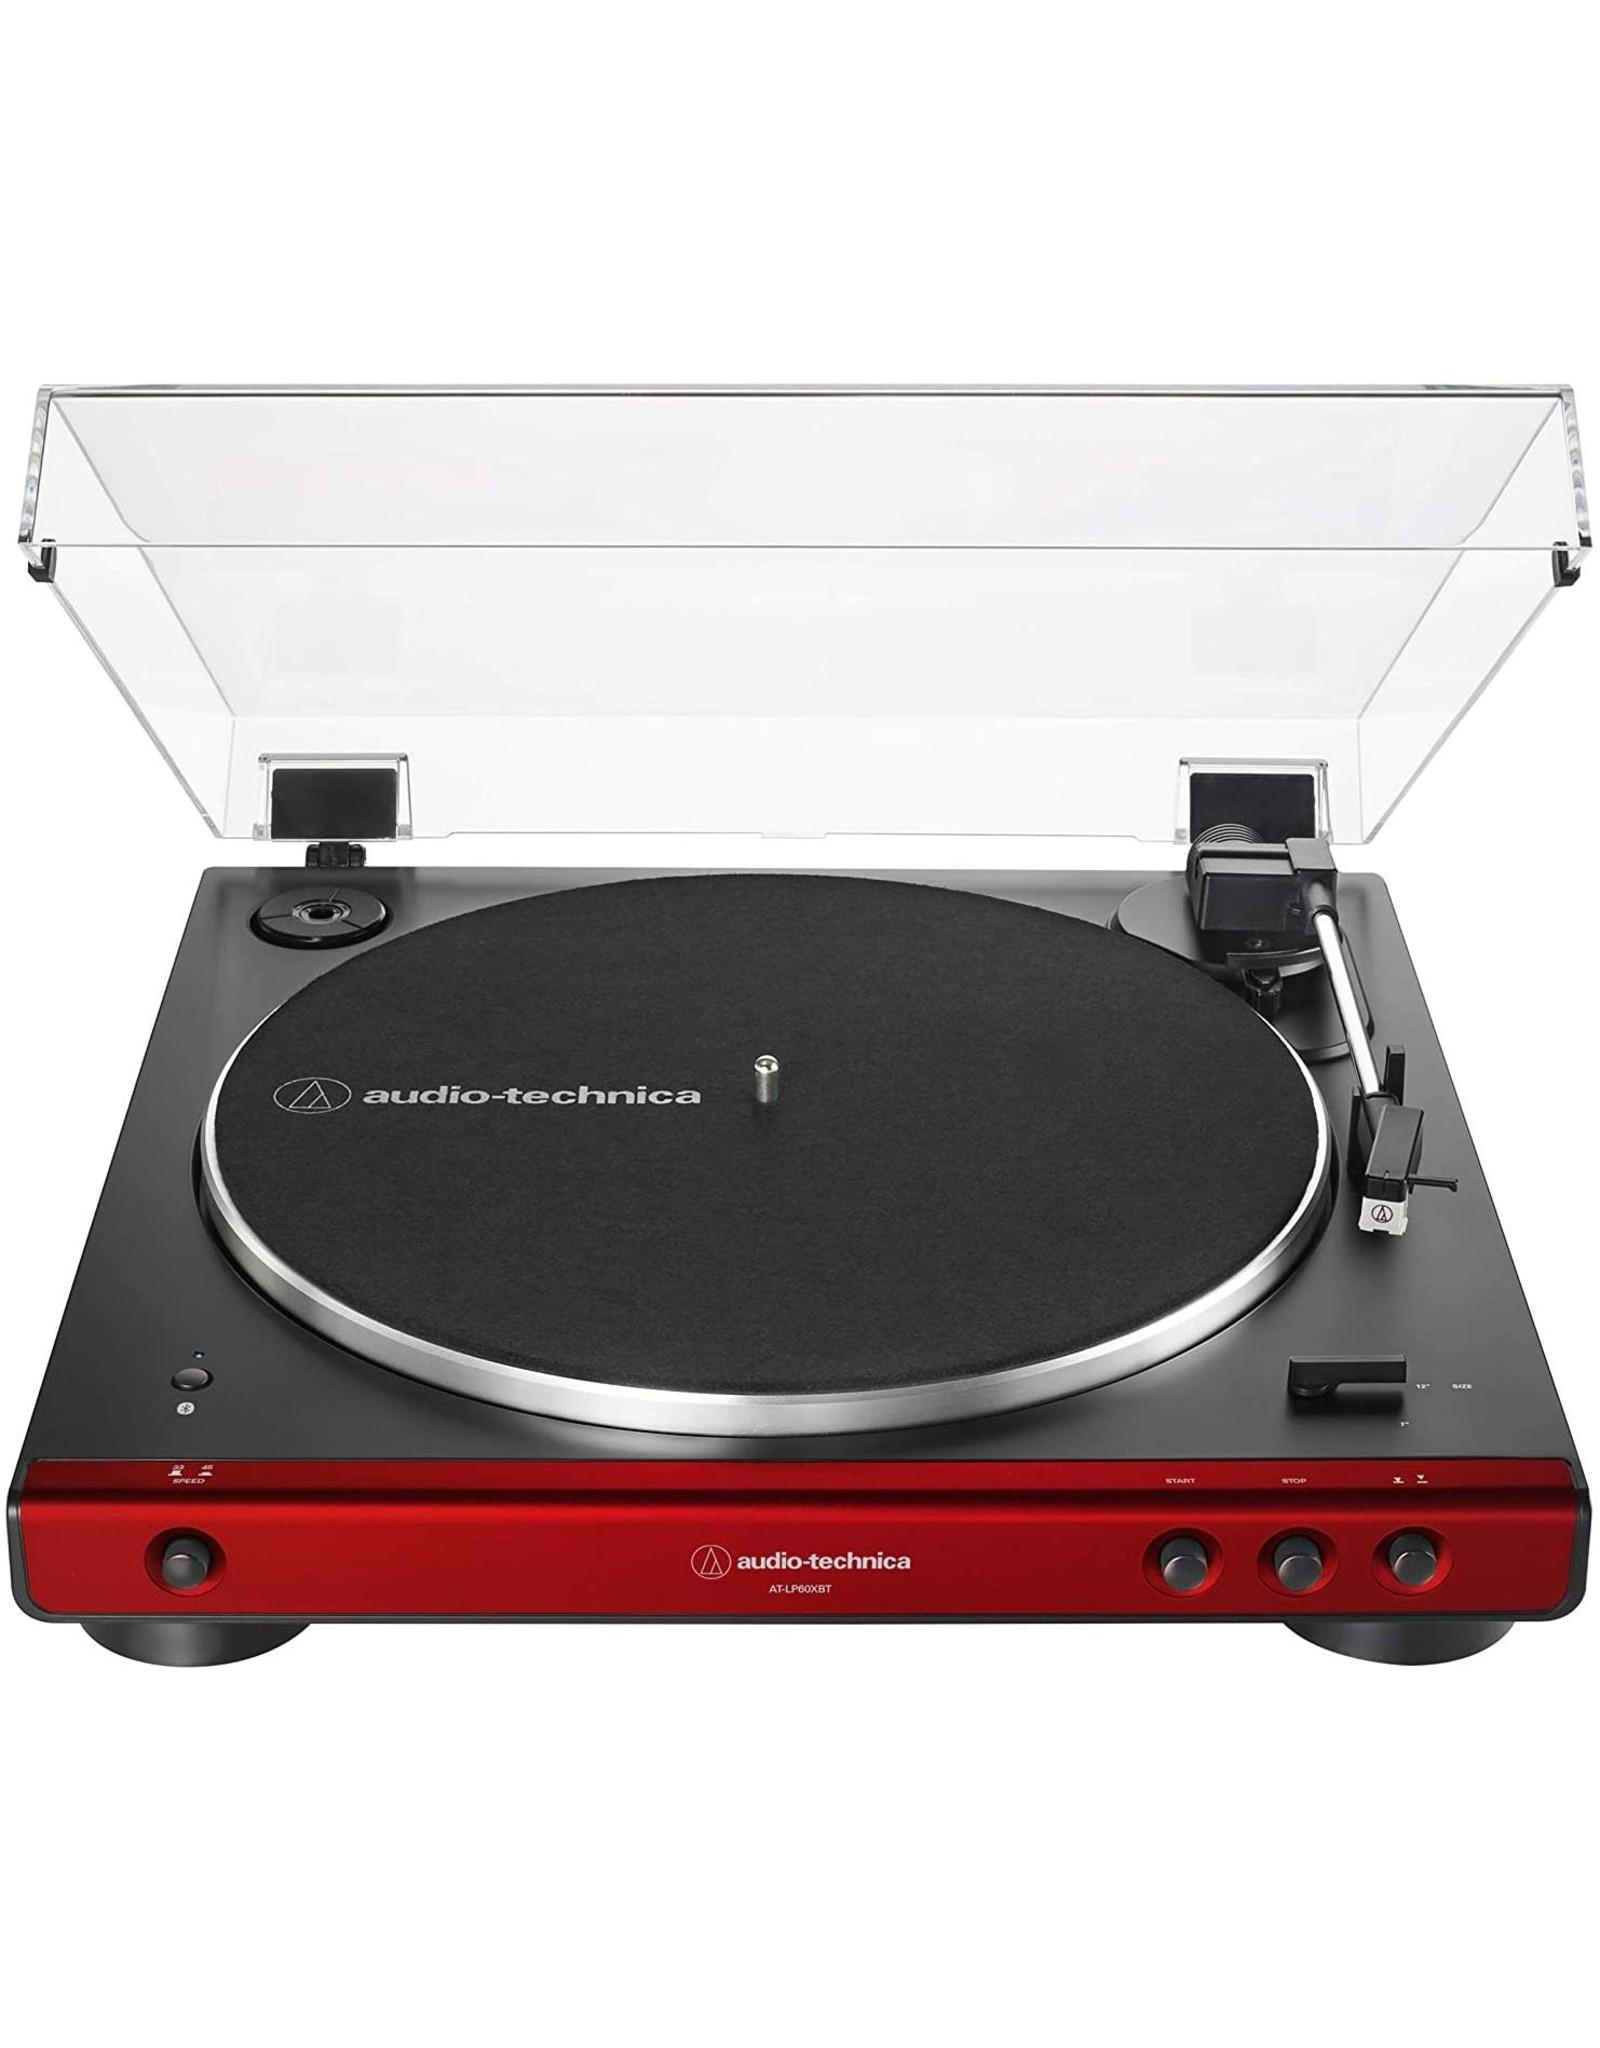 Audio-Technica Audio-Technica LP60XBT Bluetooth Turntable